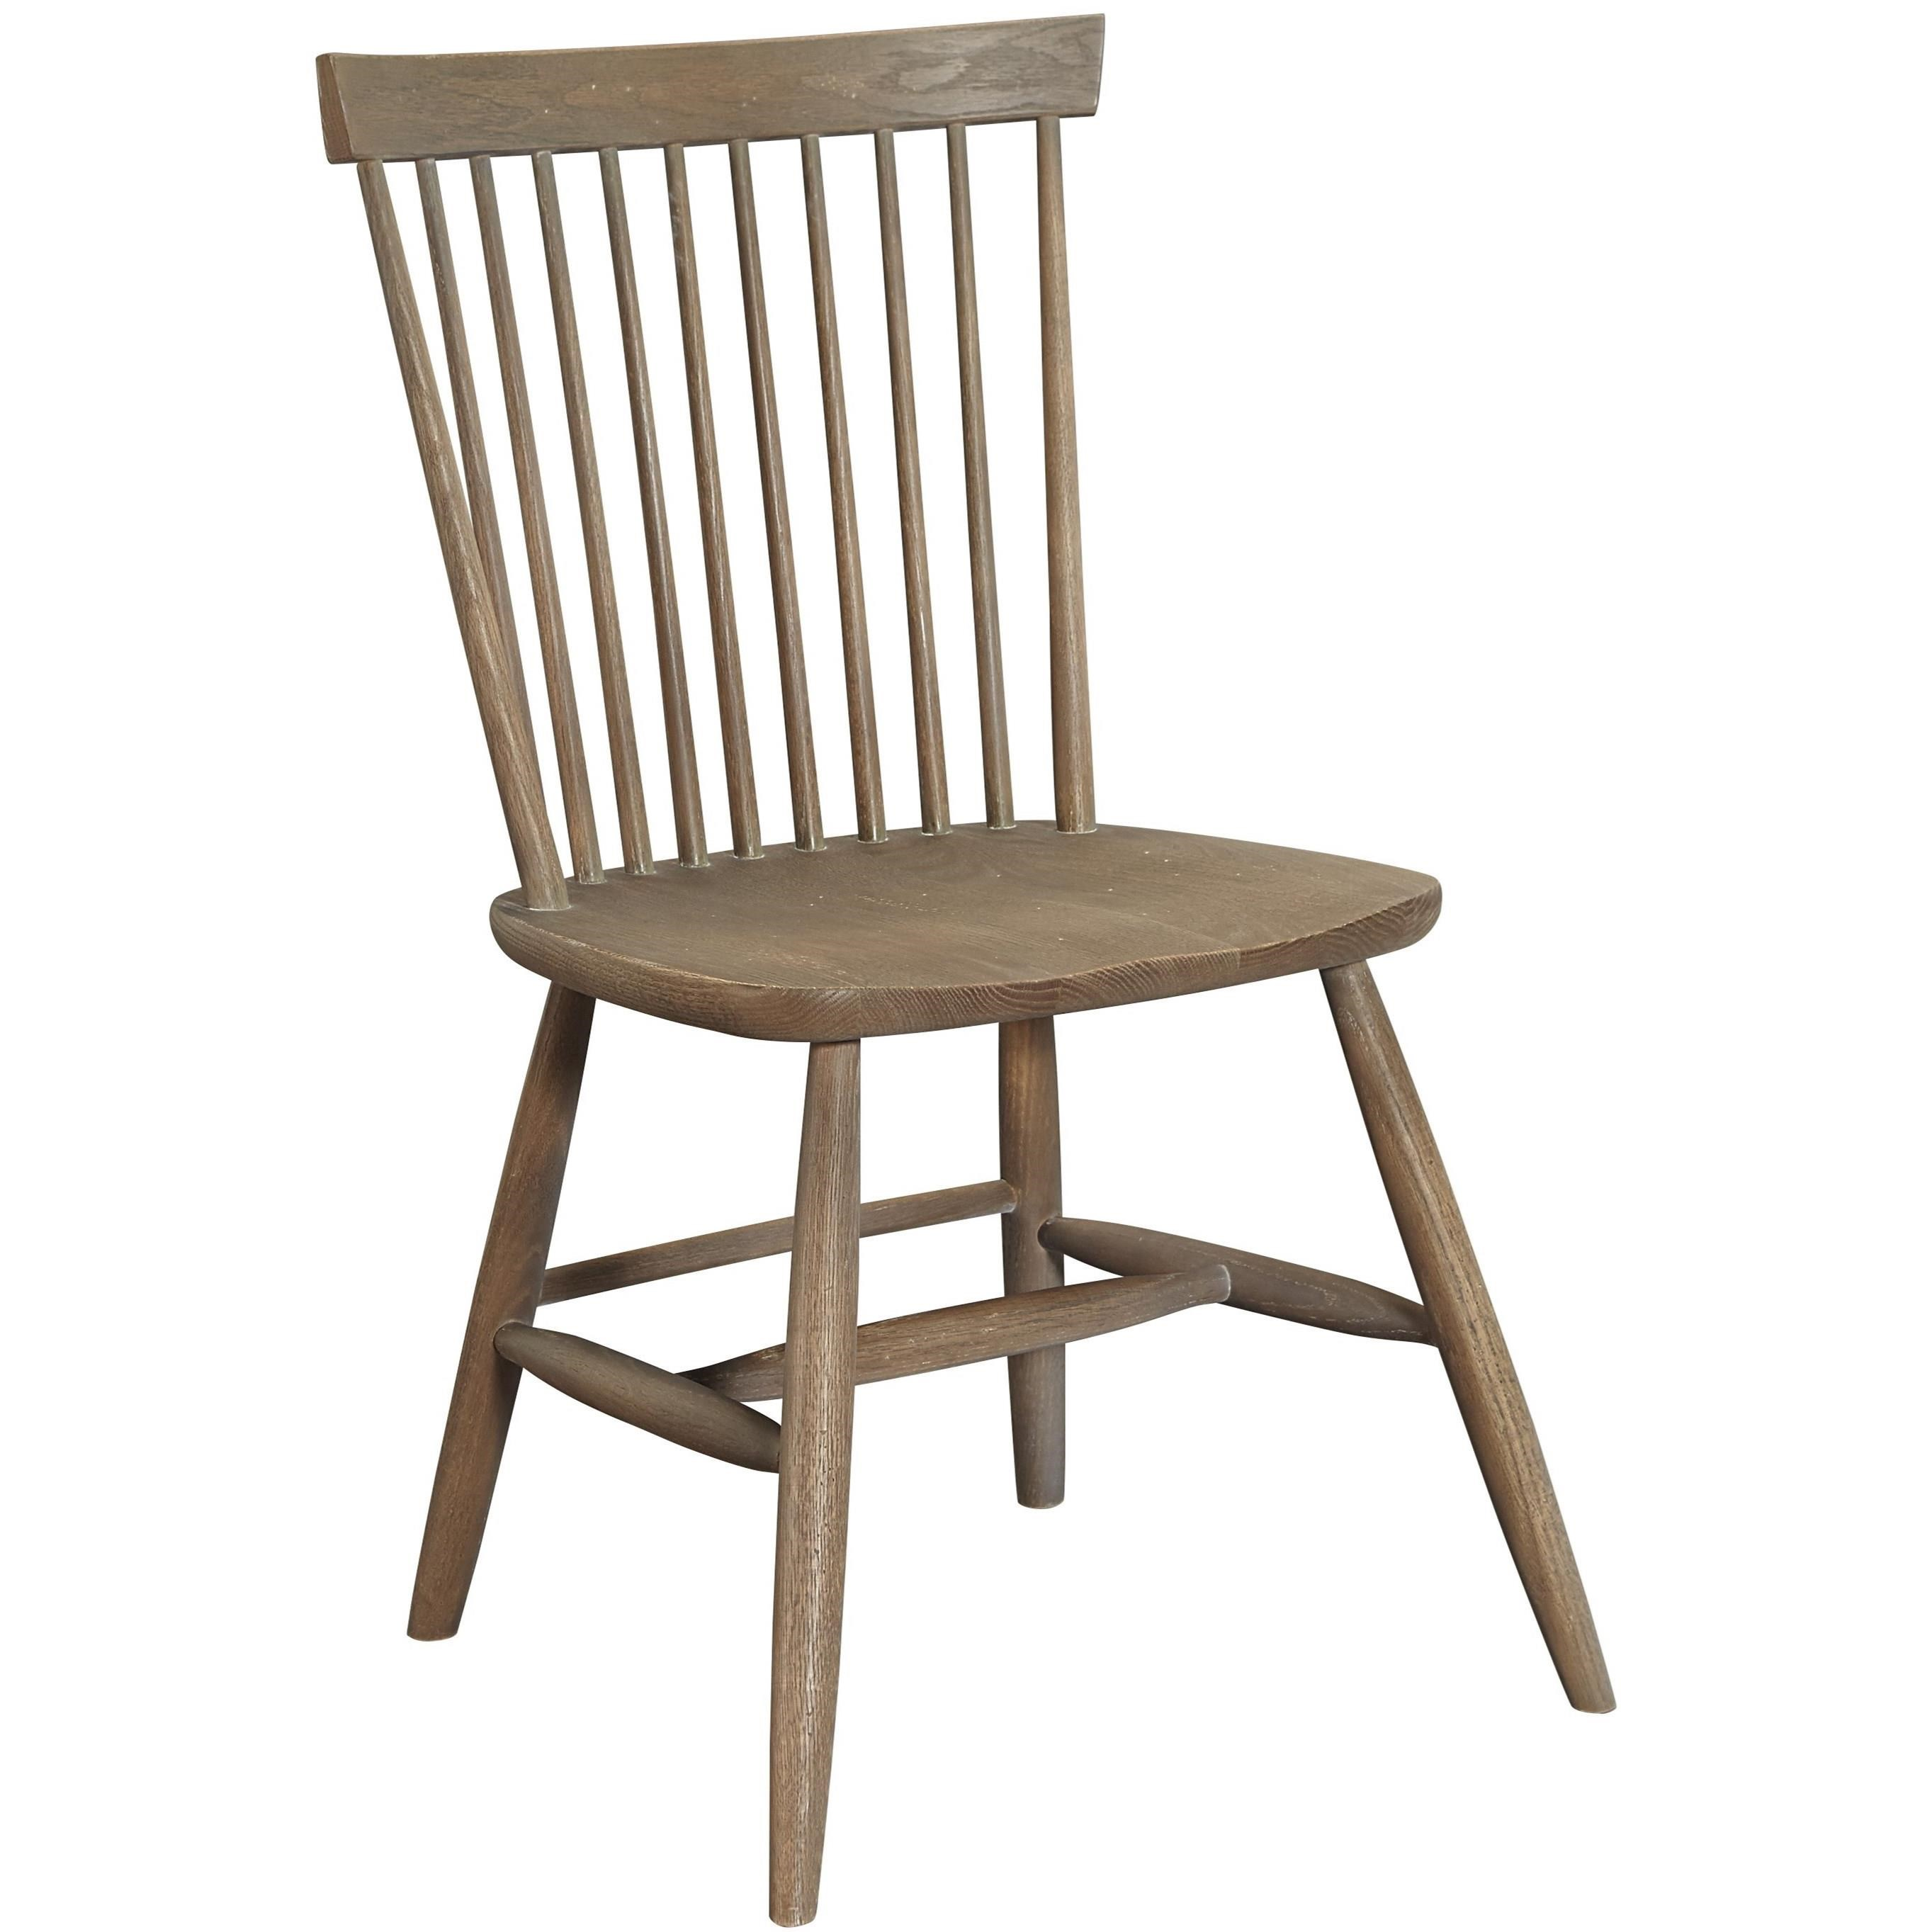 Cottage Too Desk Chair by Vaughan Bassett at Lapeer Furniture & Mattress Center